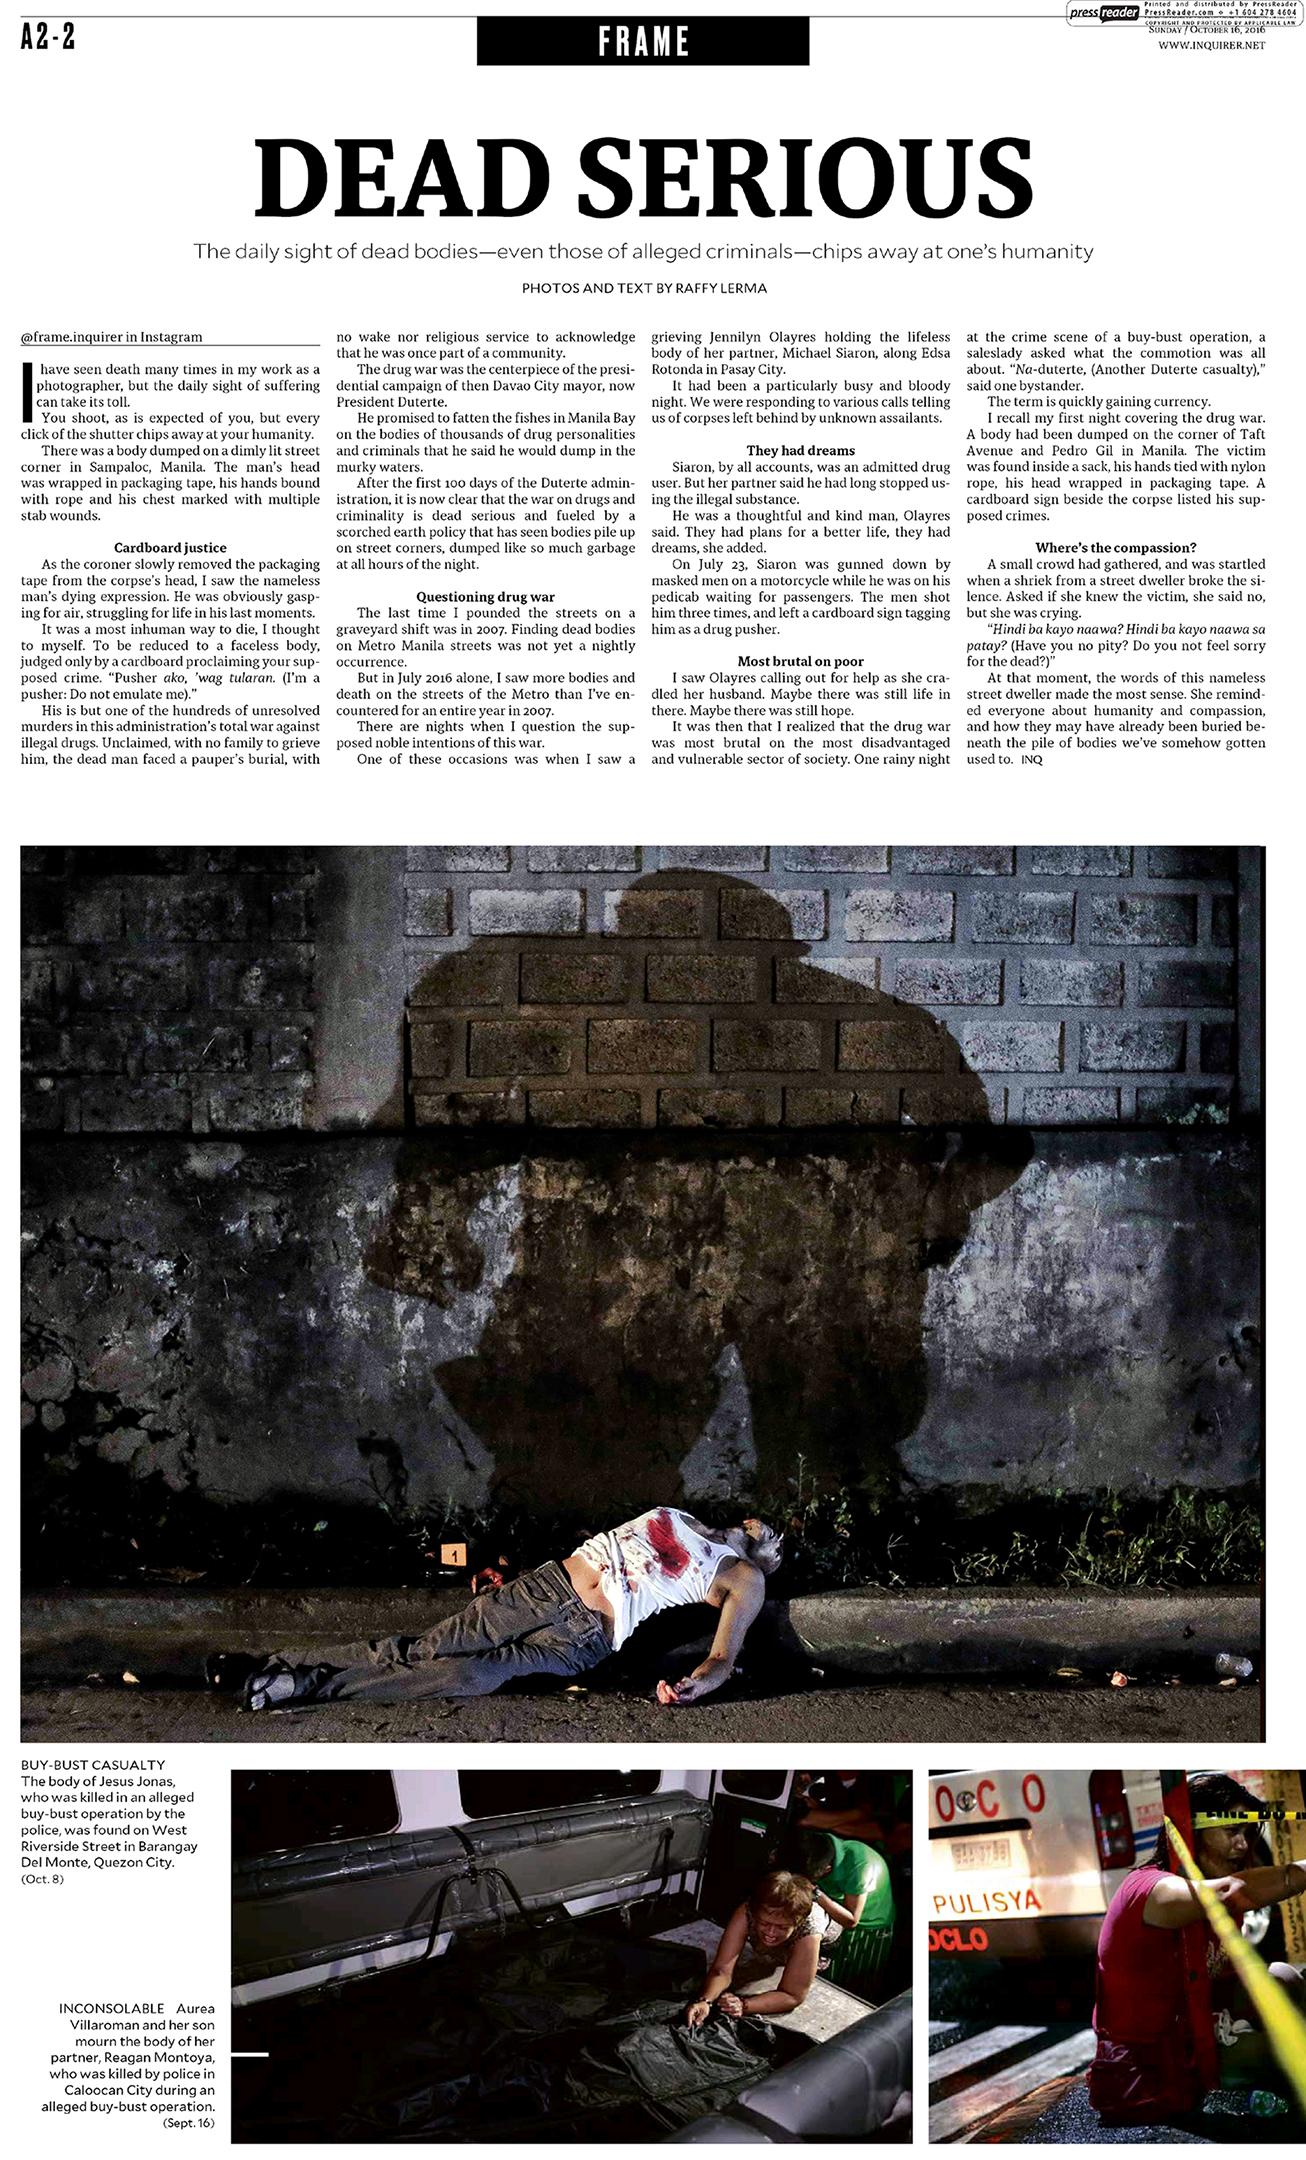 Philippine Daily Inquirer Digital Edition3.JPG